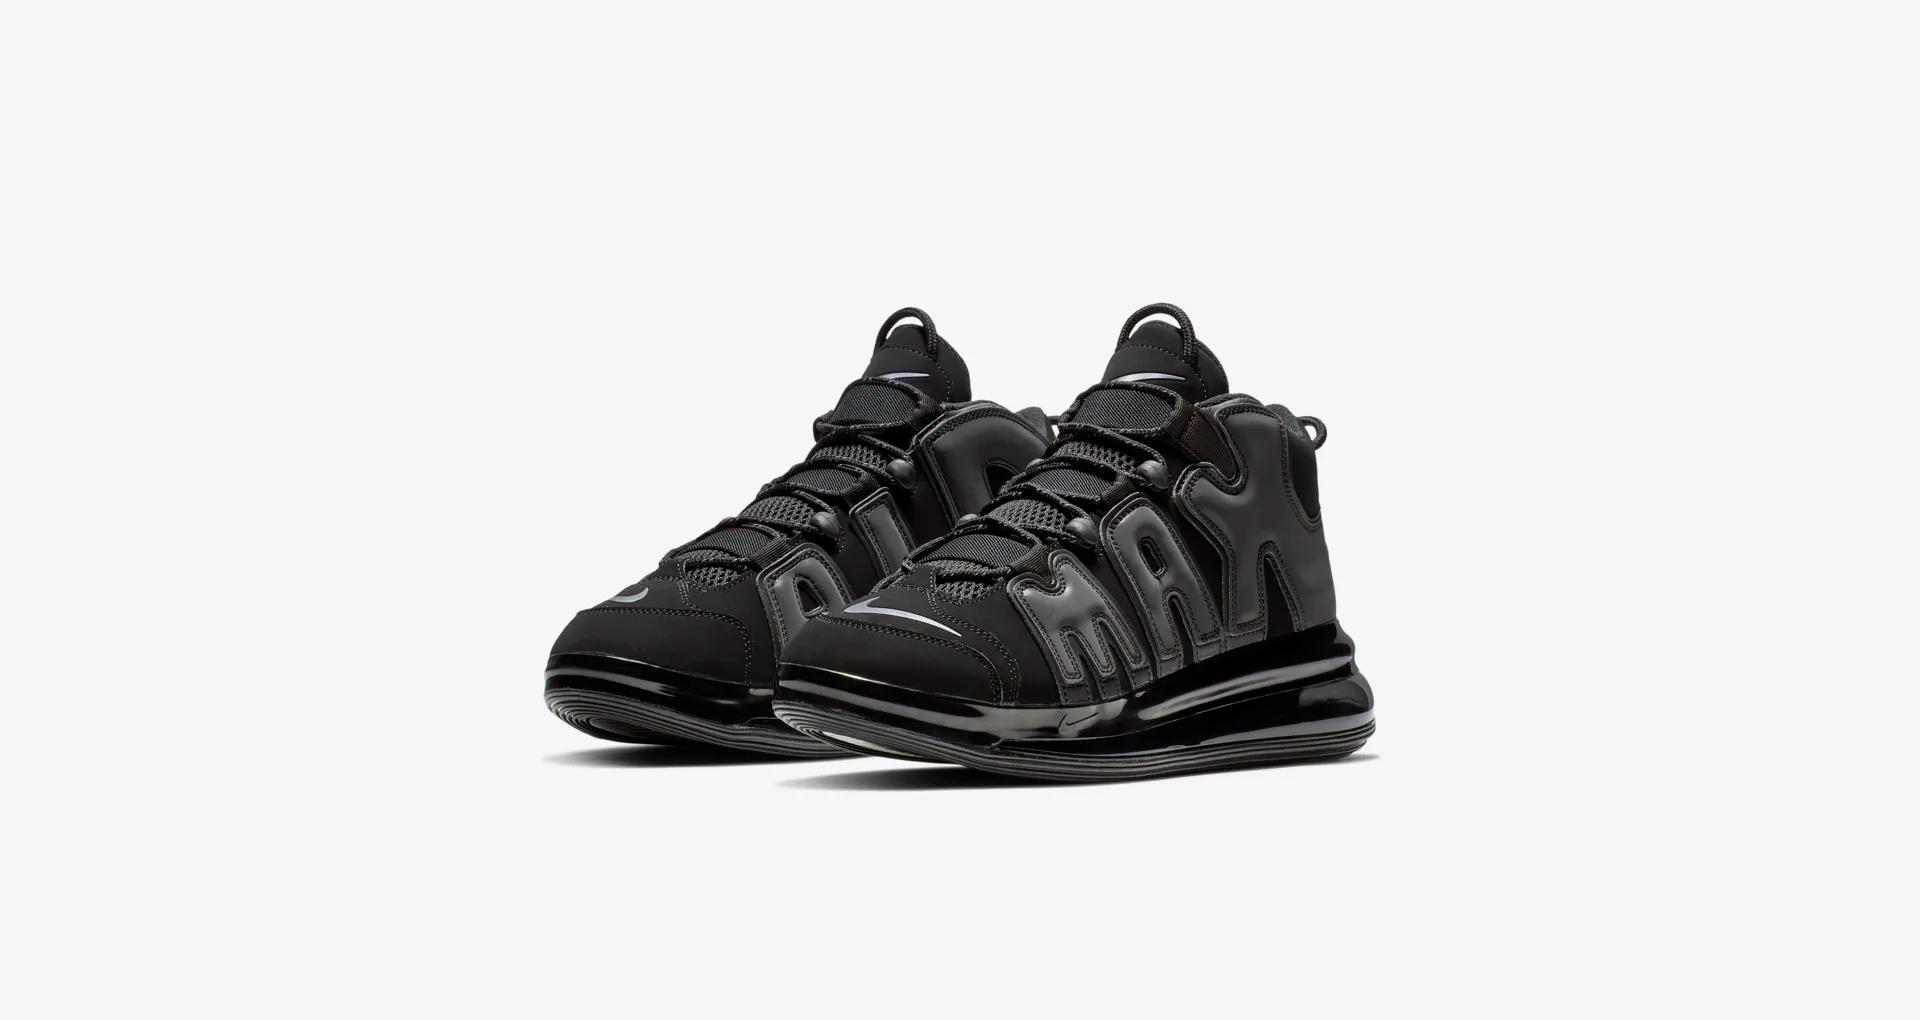 BQ7668 001 Nike Air More Uptempo 720 Black 6